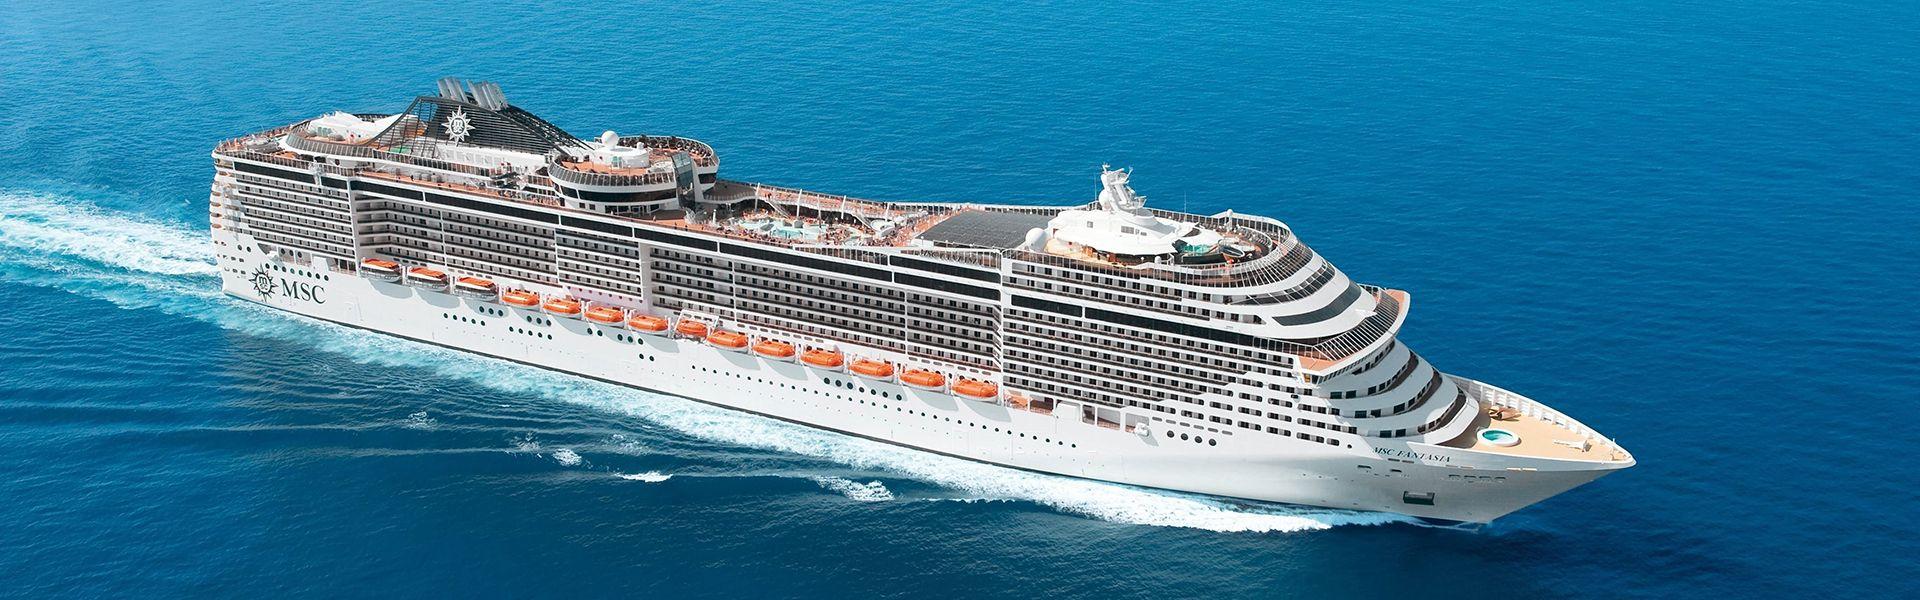 Croaziera 2017 - Emiratele Arabe Unite (Dubai) - MSC Cruises - MSC Fantasia - 7 nopti